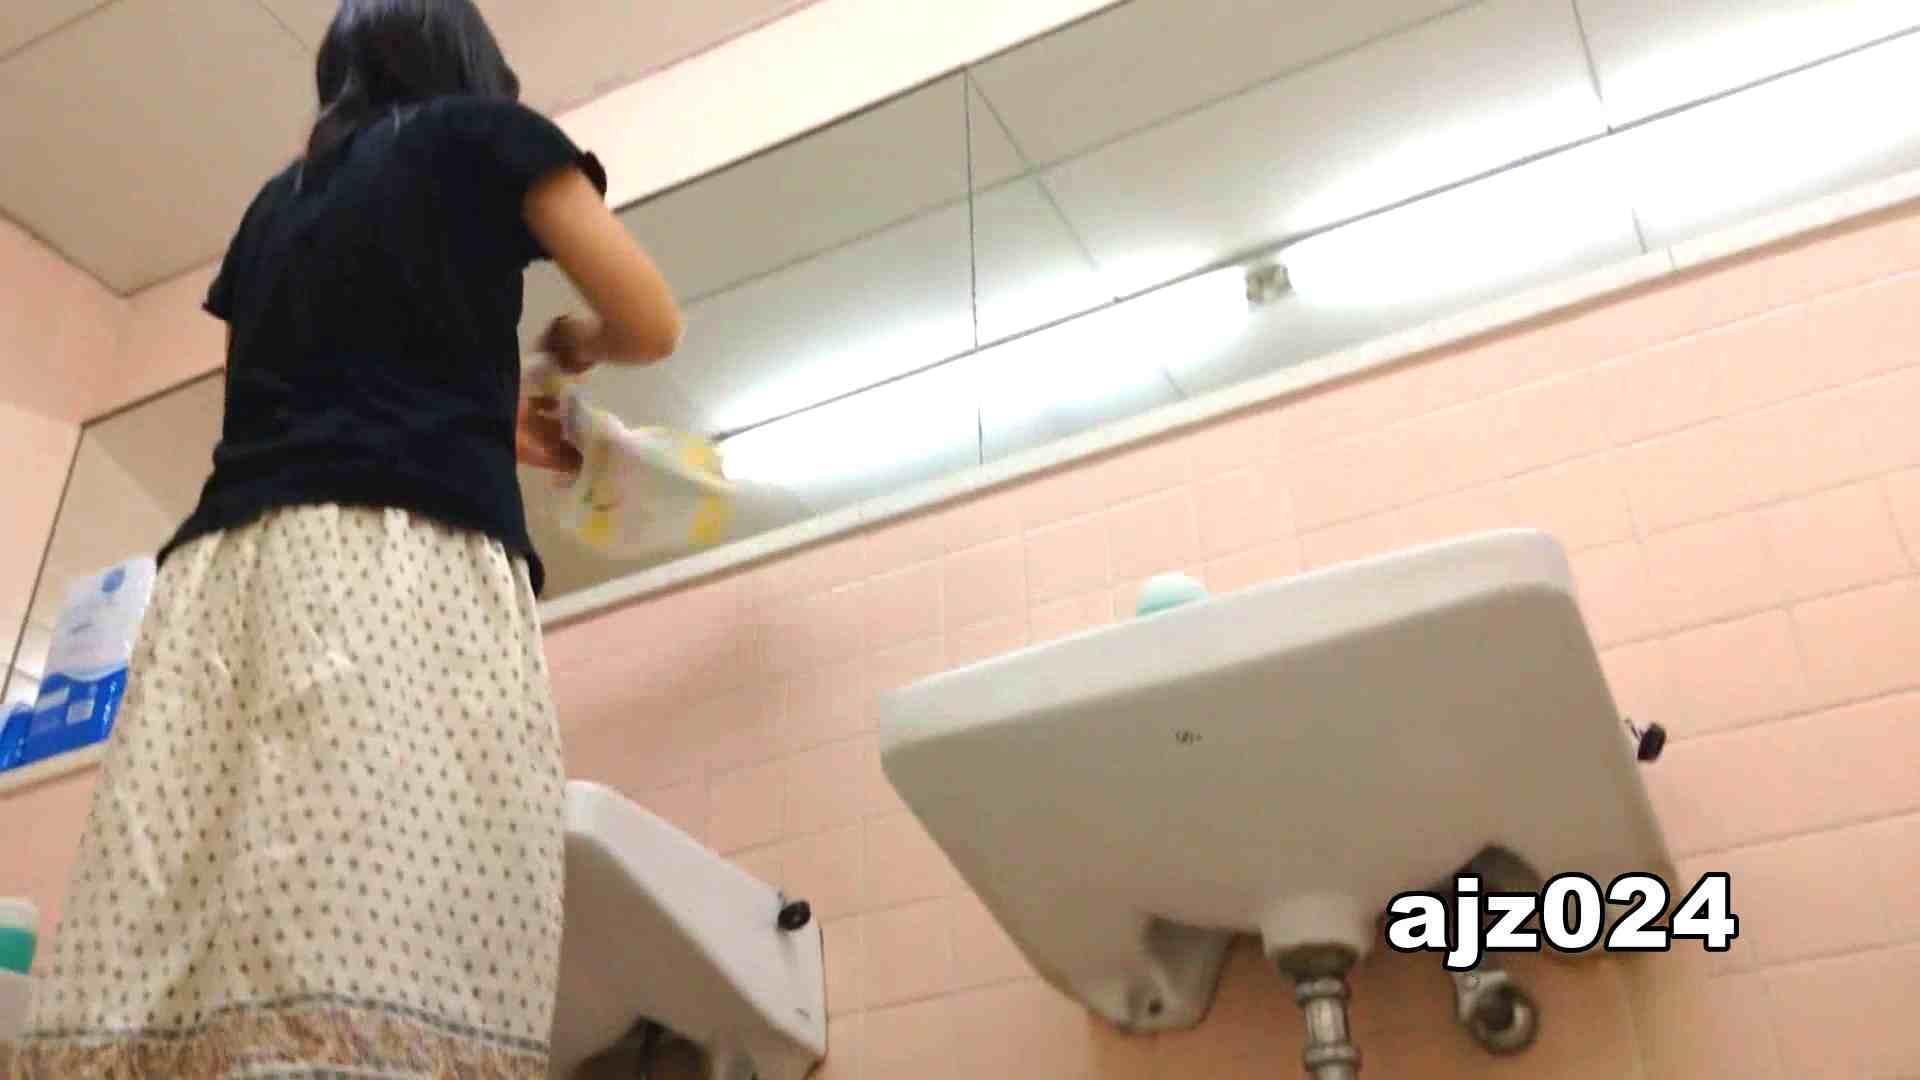 某有名大学女性洗面所 vol.24 OL女体 AV動画キャプチャ 66連発 20